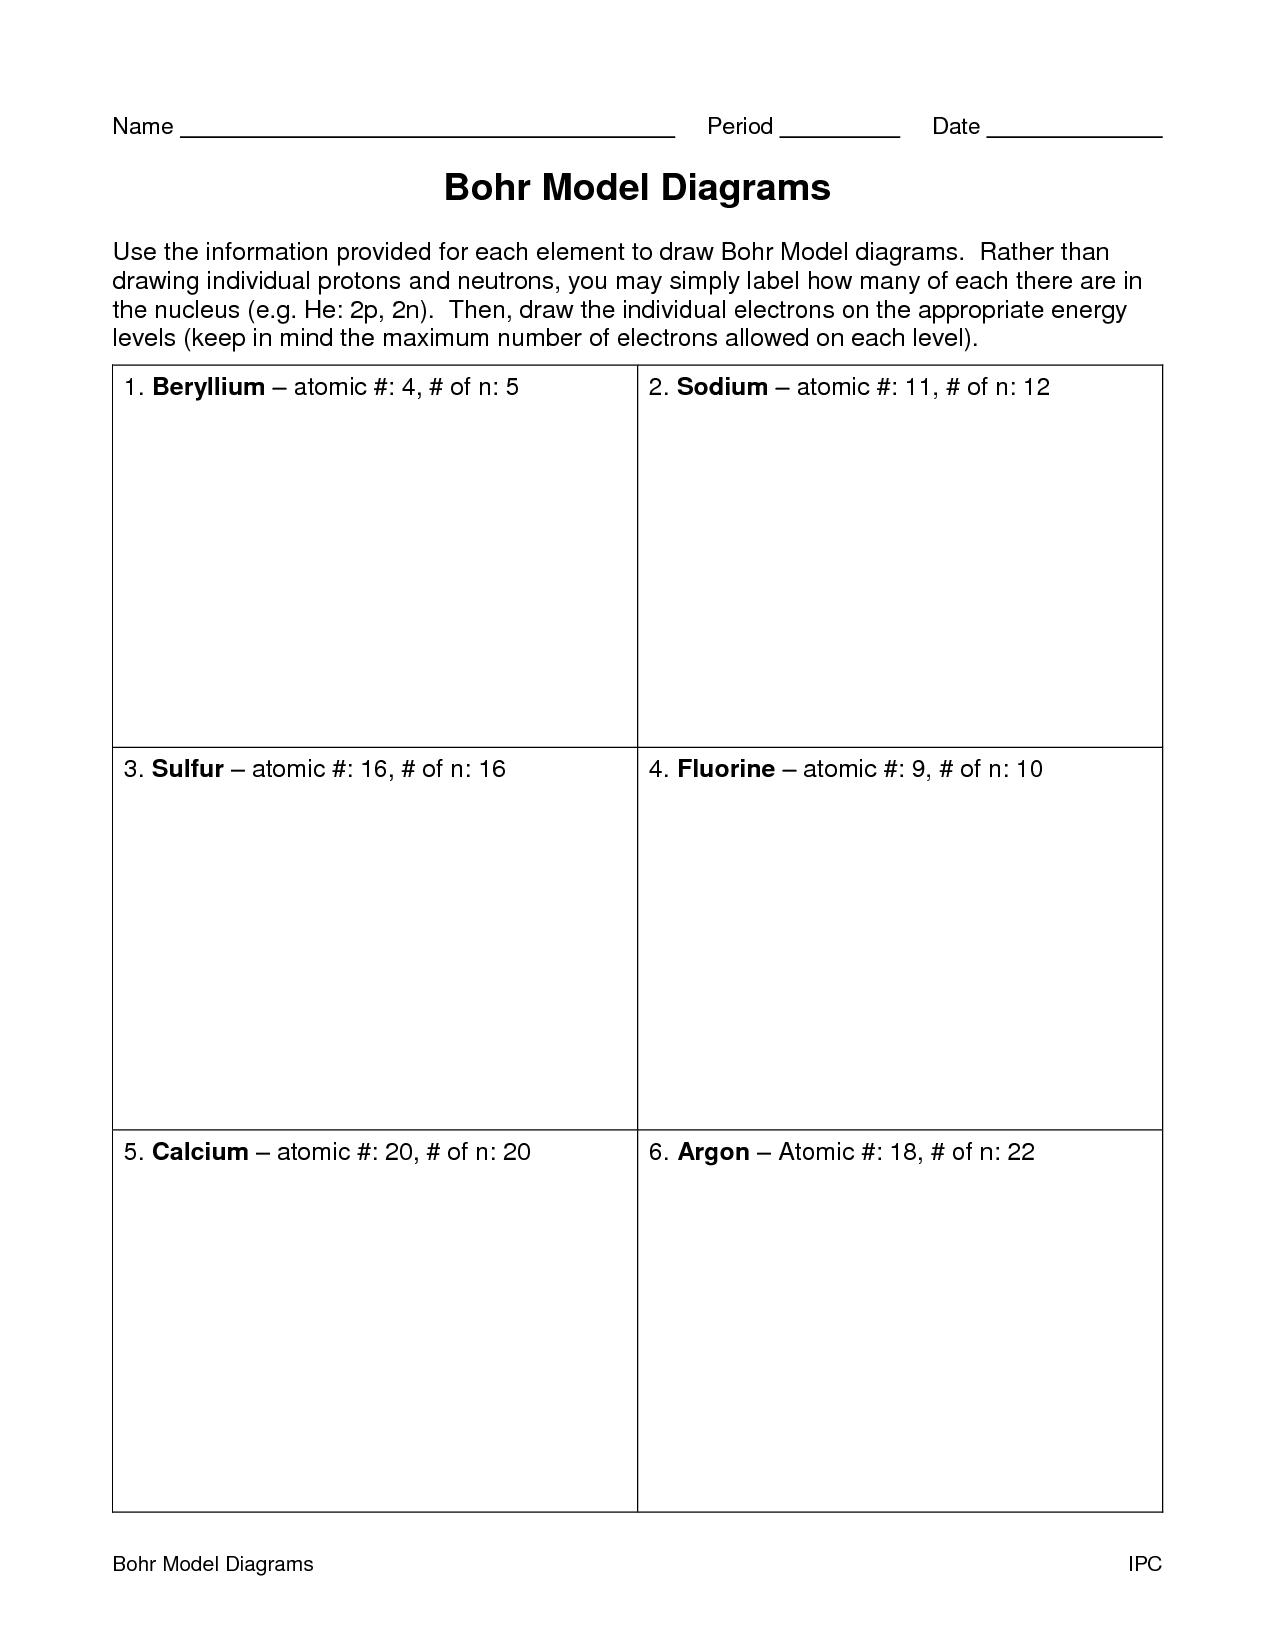 Bohr Model Diagrams Worksheet Answers